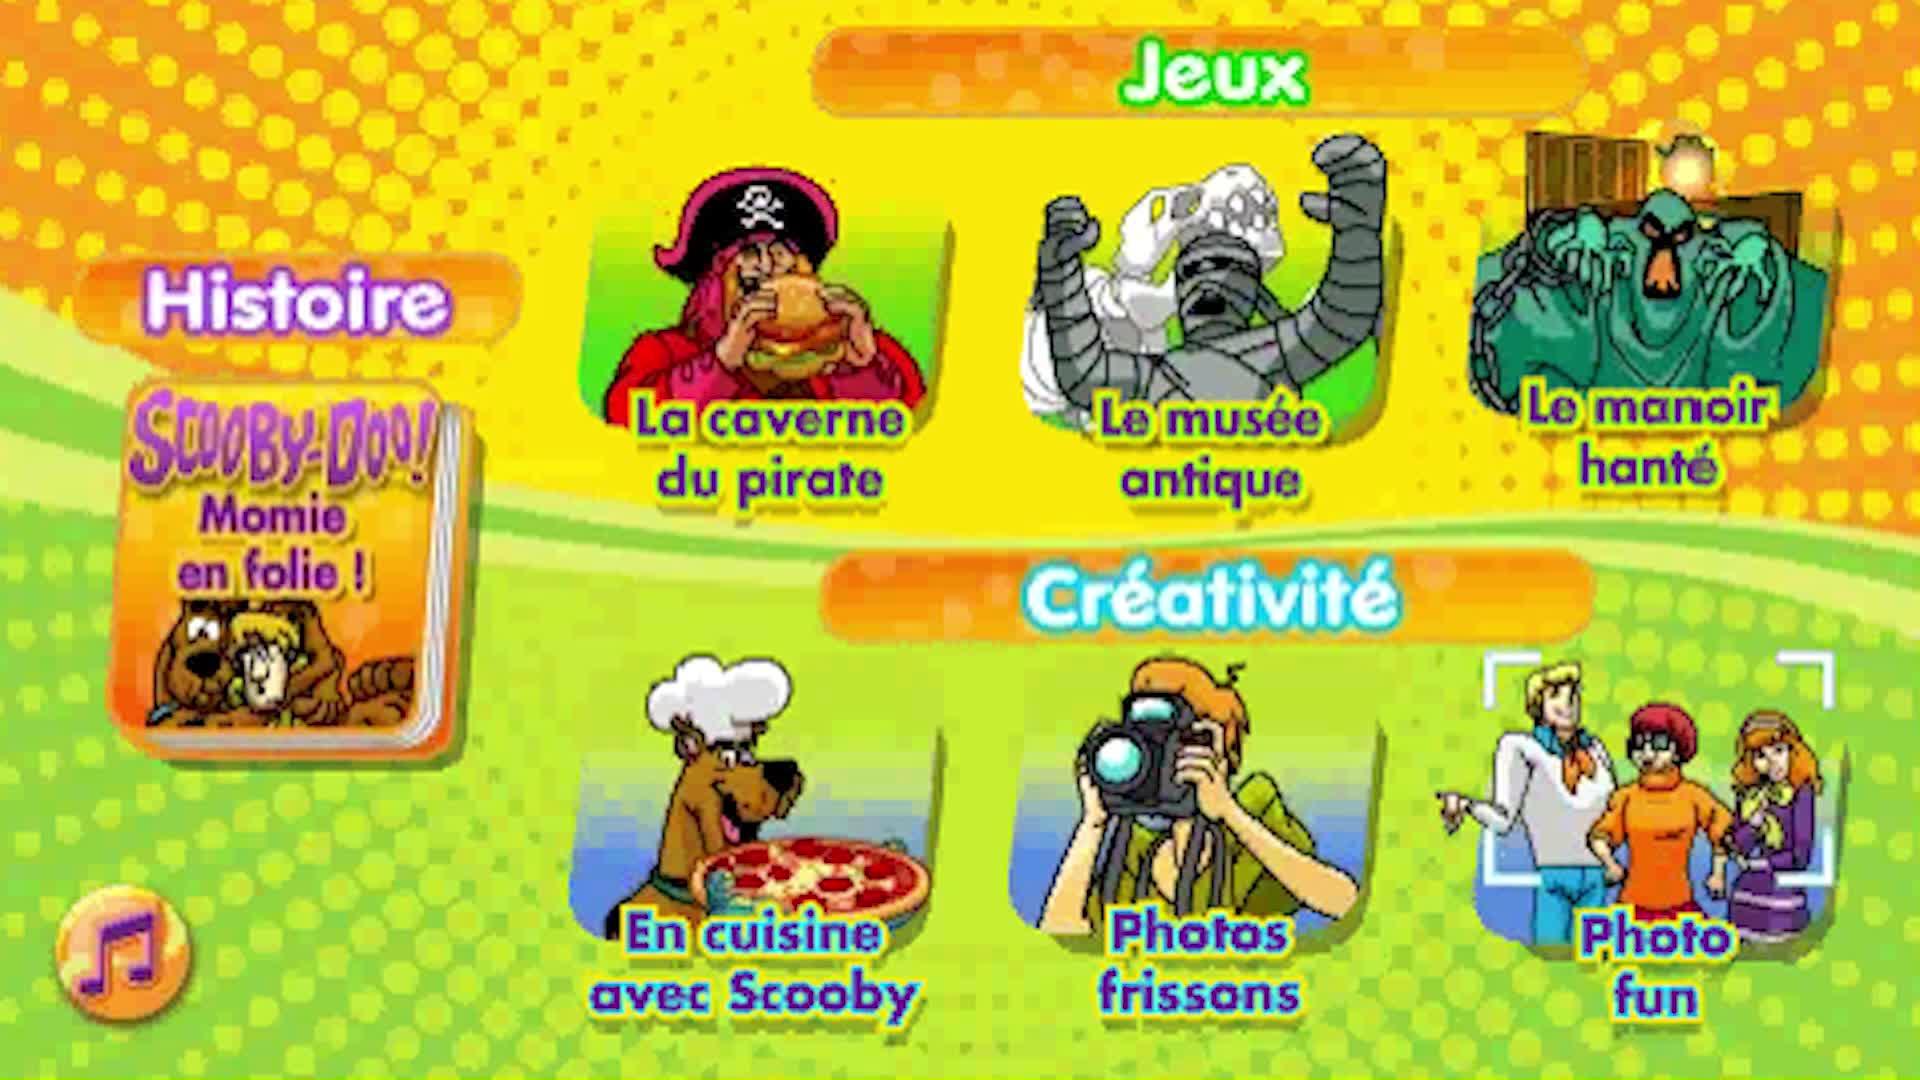 Vtech jeux storio et storio 2 scooby doo jouet - Jouets scooby doo ...